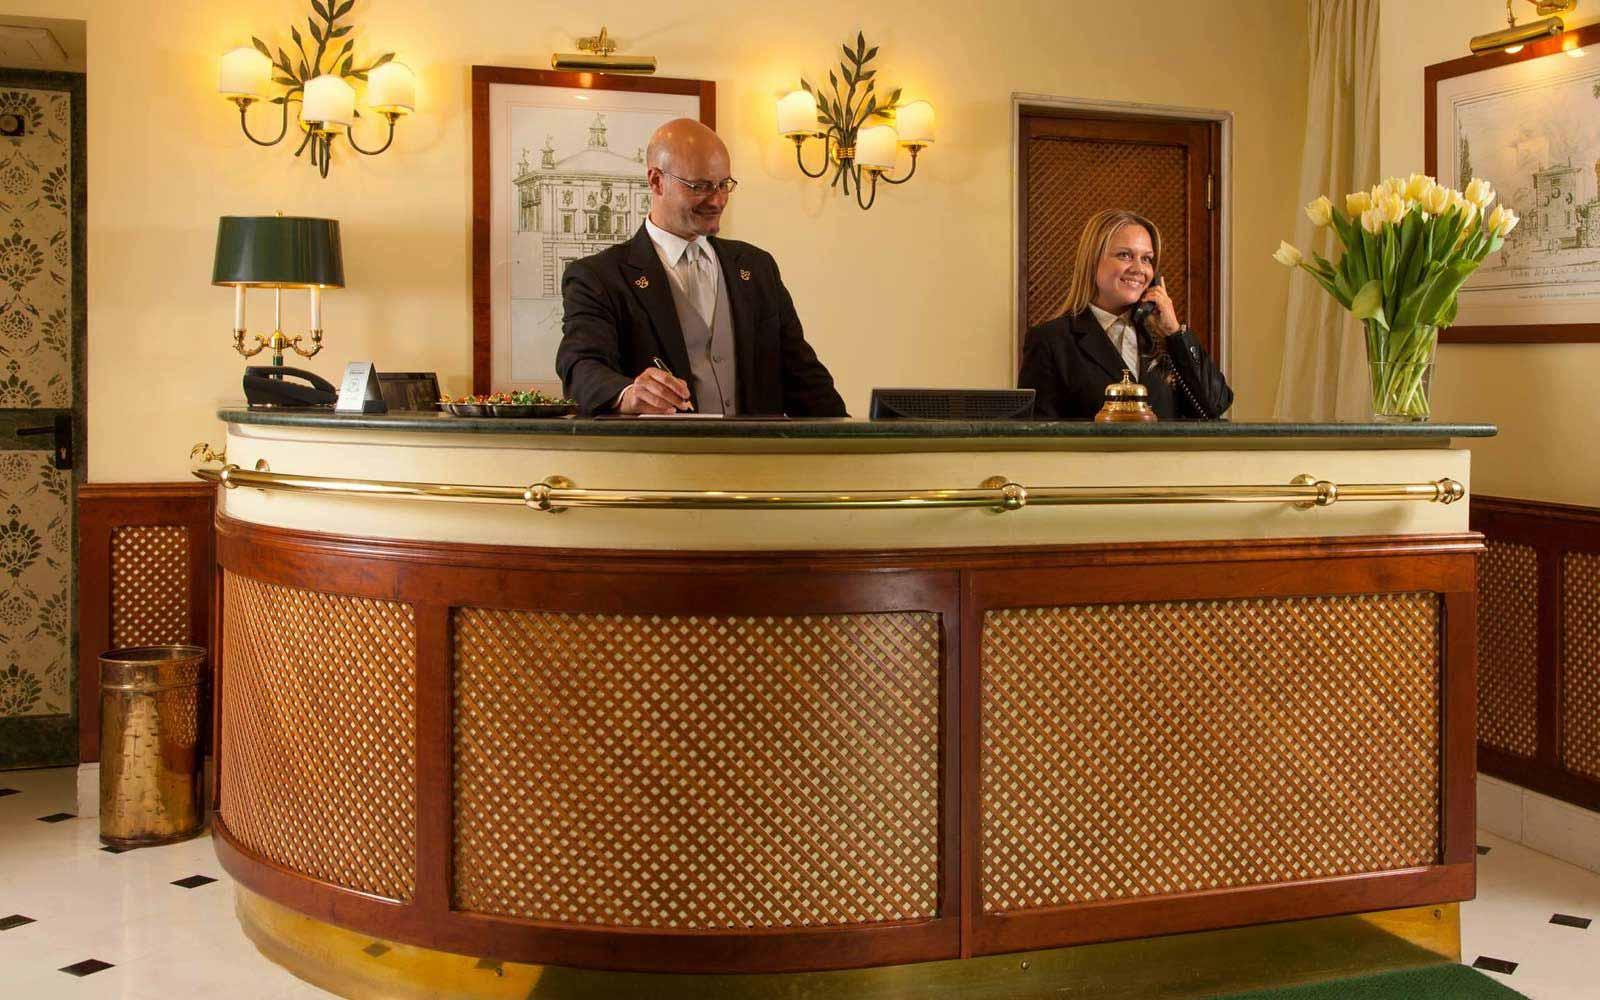 Reception at Hotel Ludovisi Palace